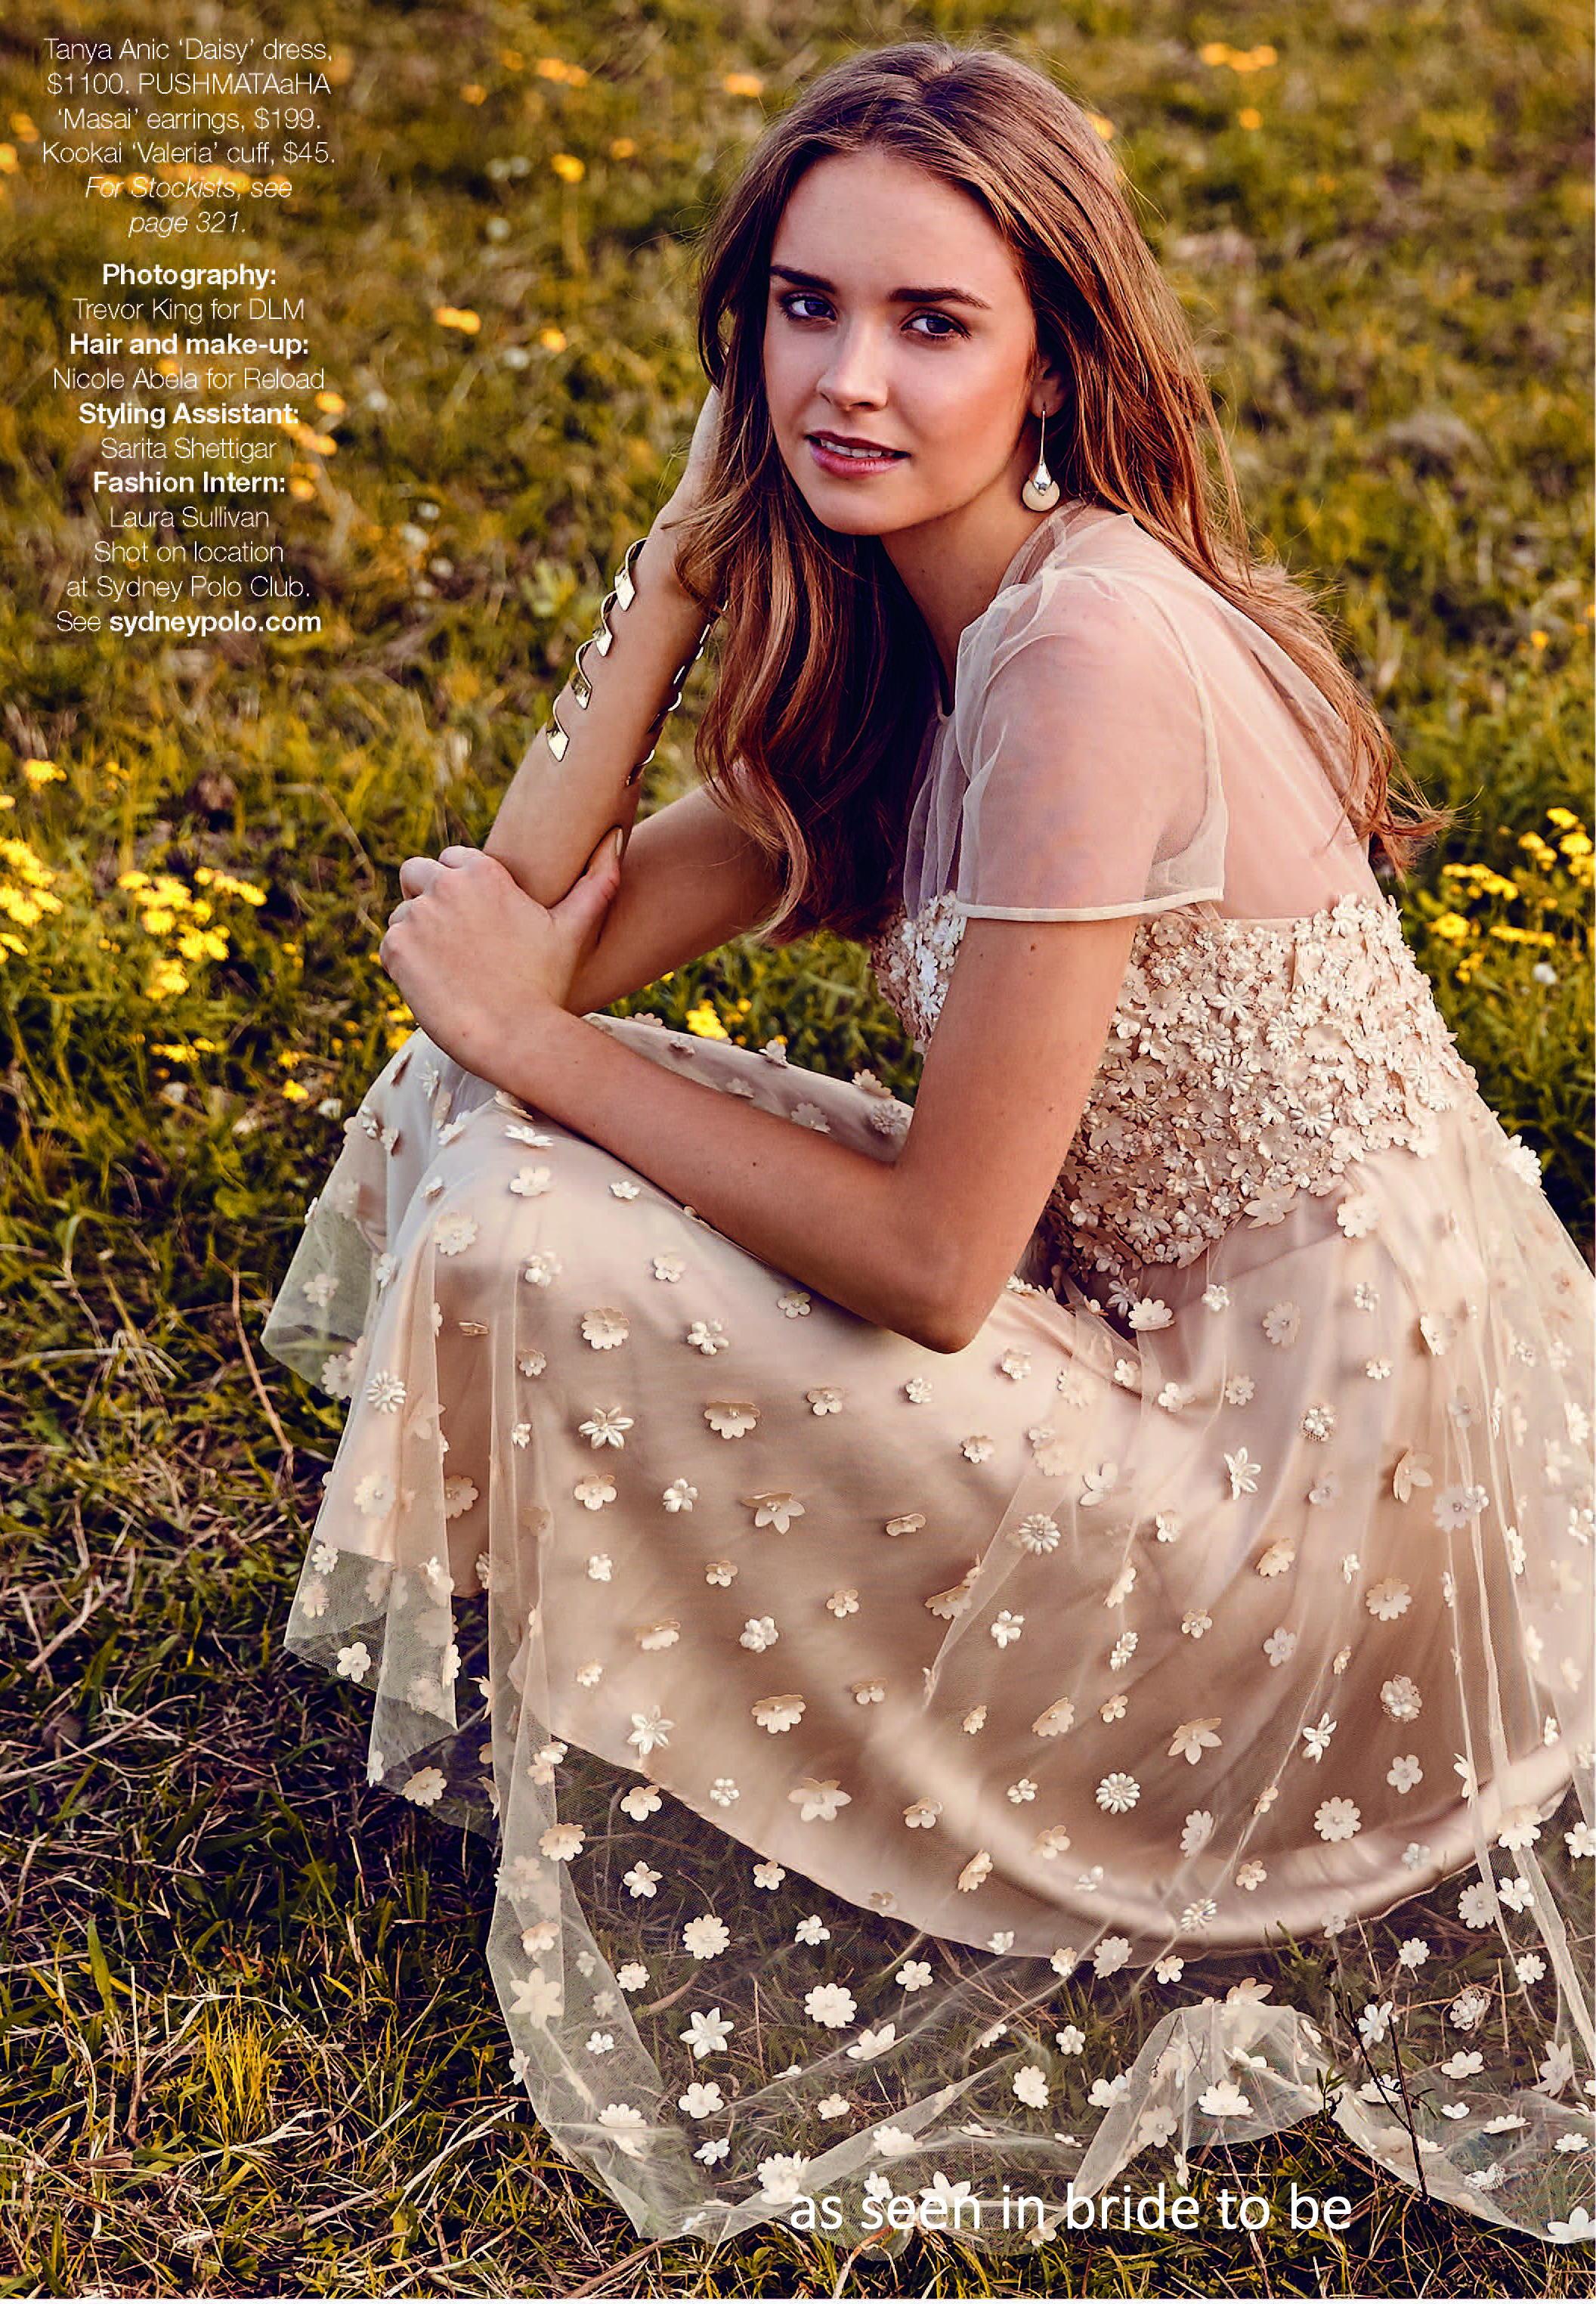 daisy by tanya anic bridal photography Trevor King DLM bride to be magazine sydney bride.jpg